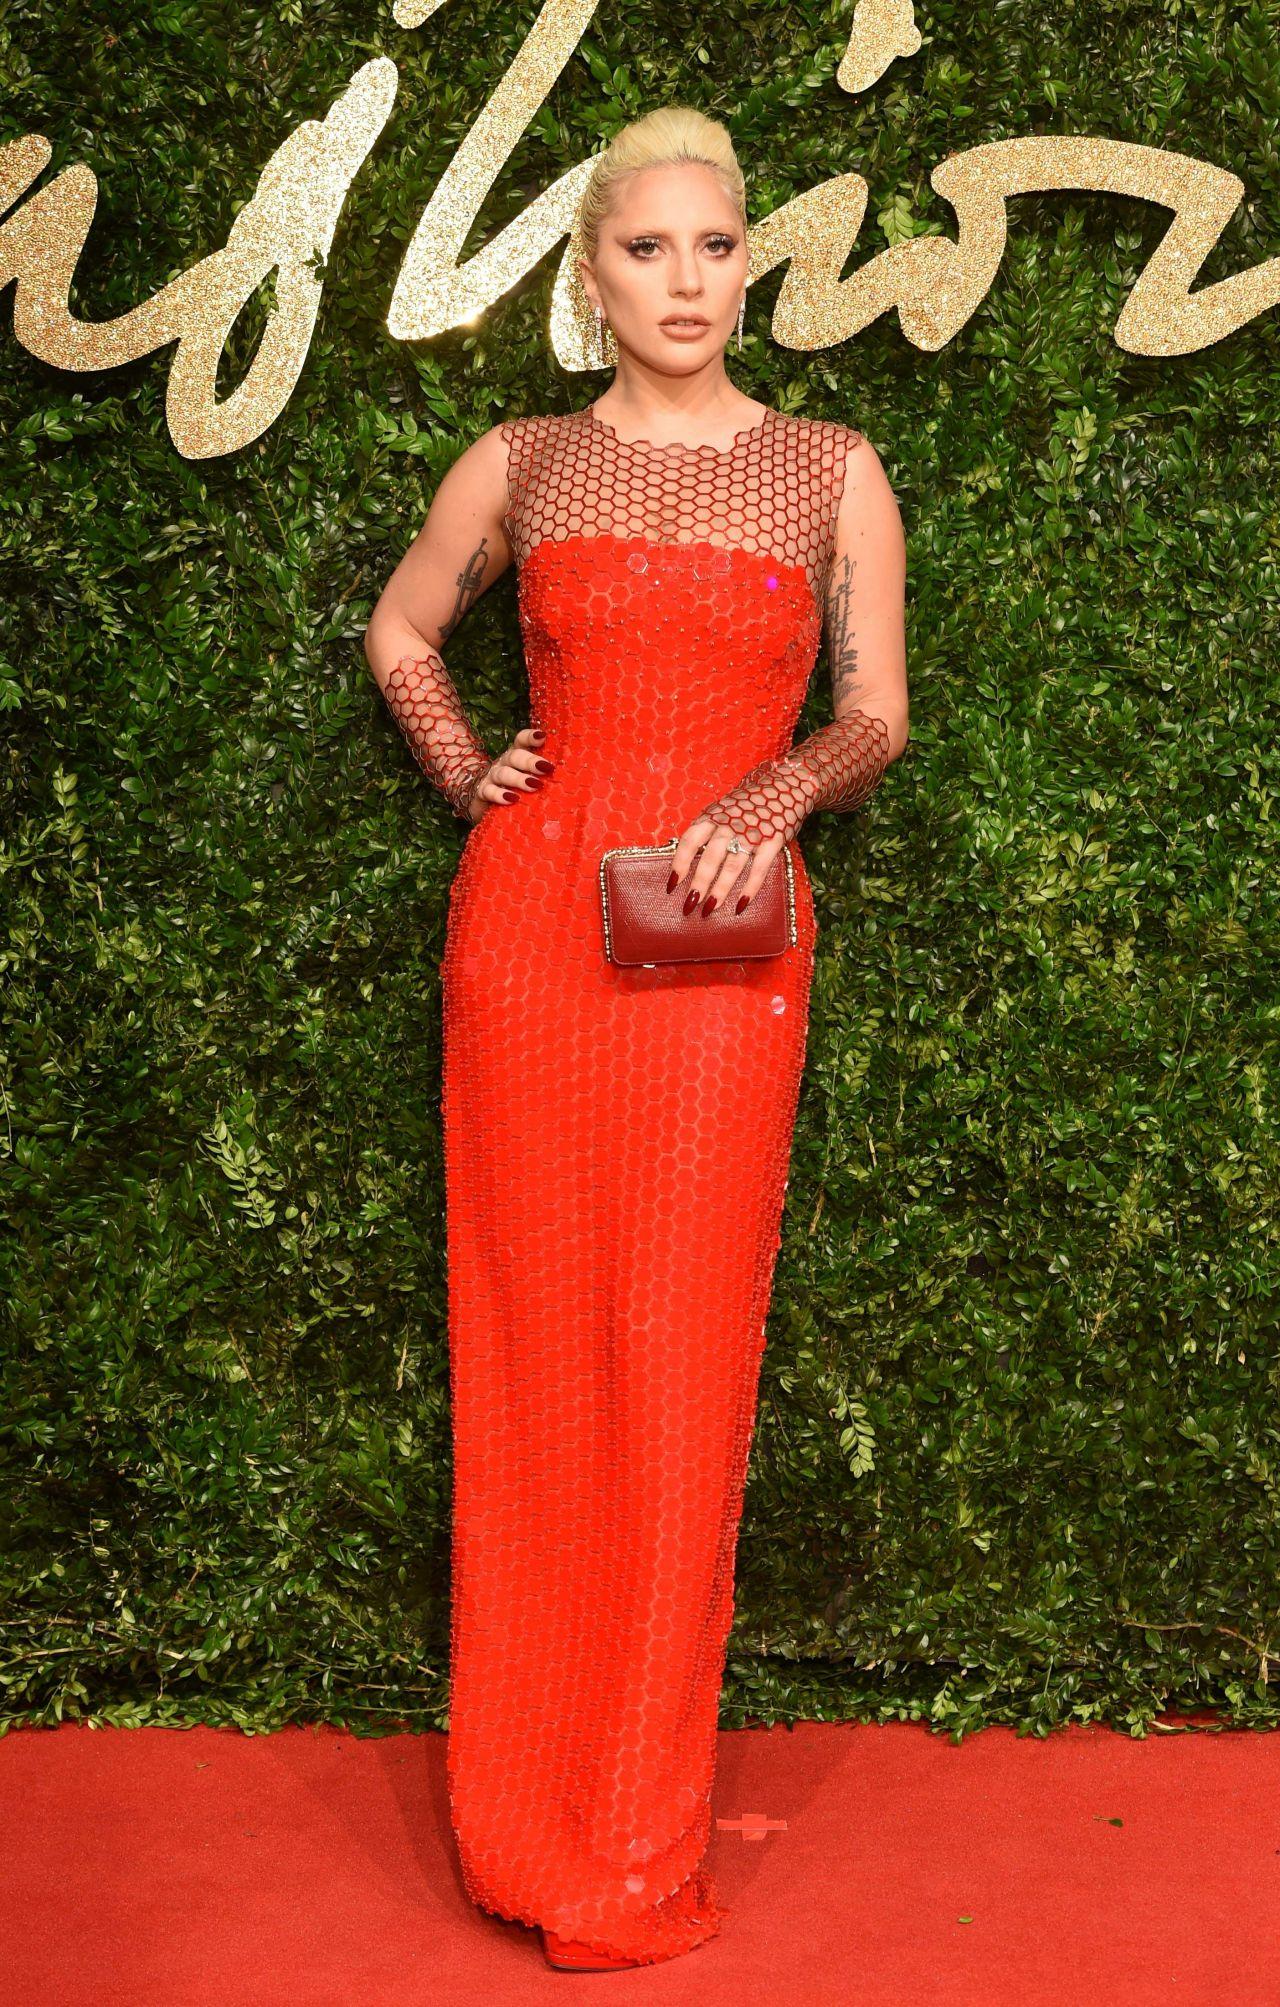 lady-gaga-british-fashion-awards-2015-at-london-coliseum_7